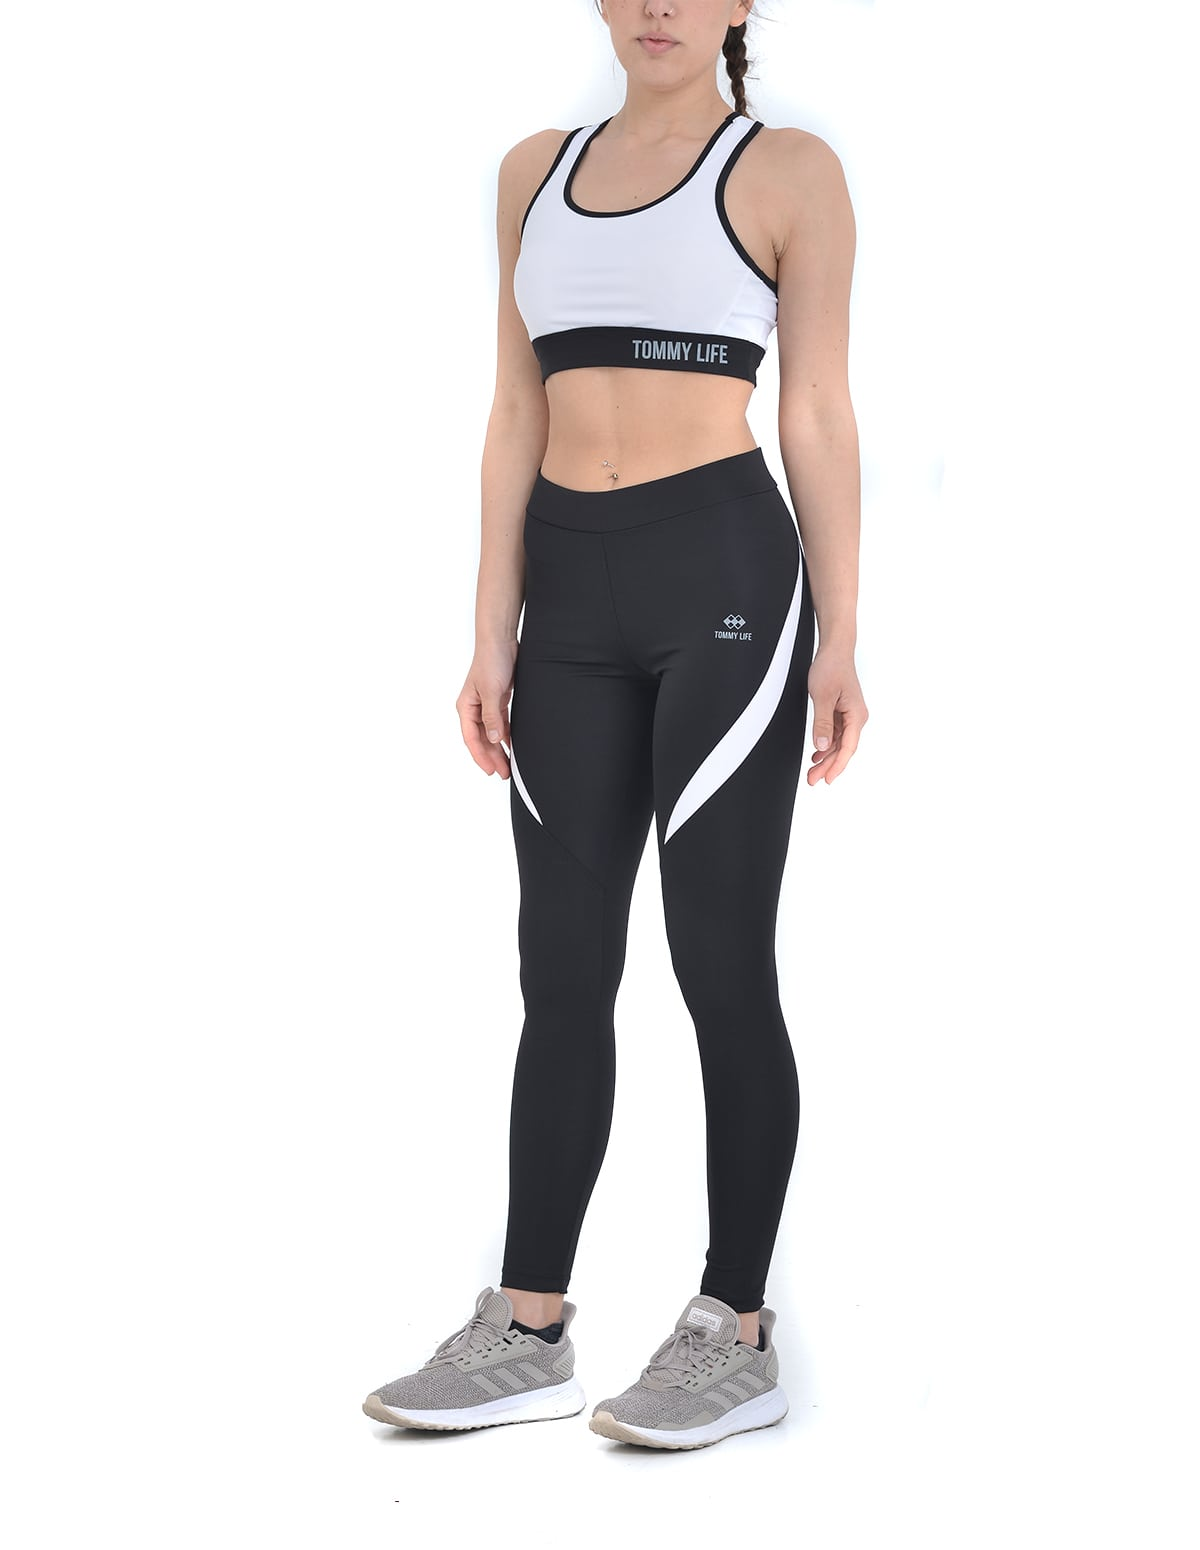 05f704c2c73 Αθλητικό σετ μπουστάκι και κολάν σε μαύρο-λευκό χρώμα - vactive.gr